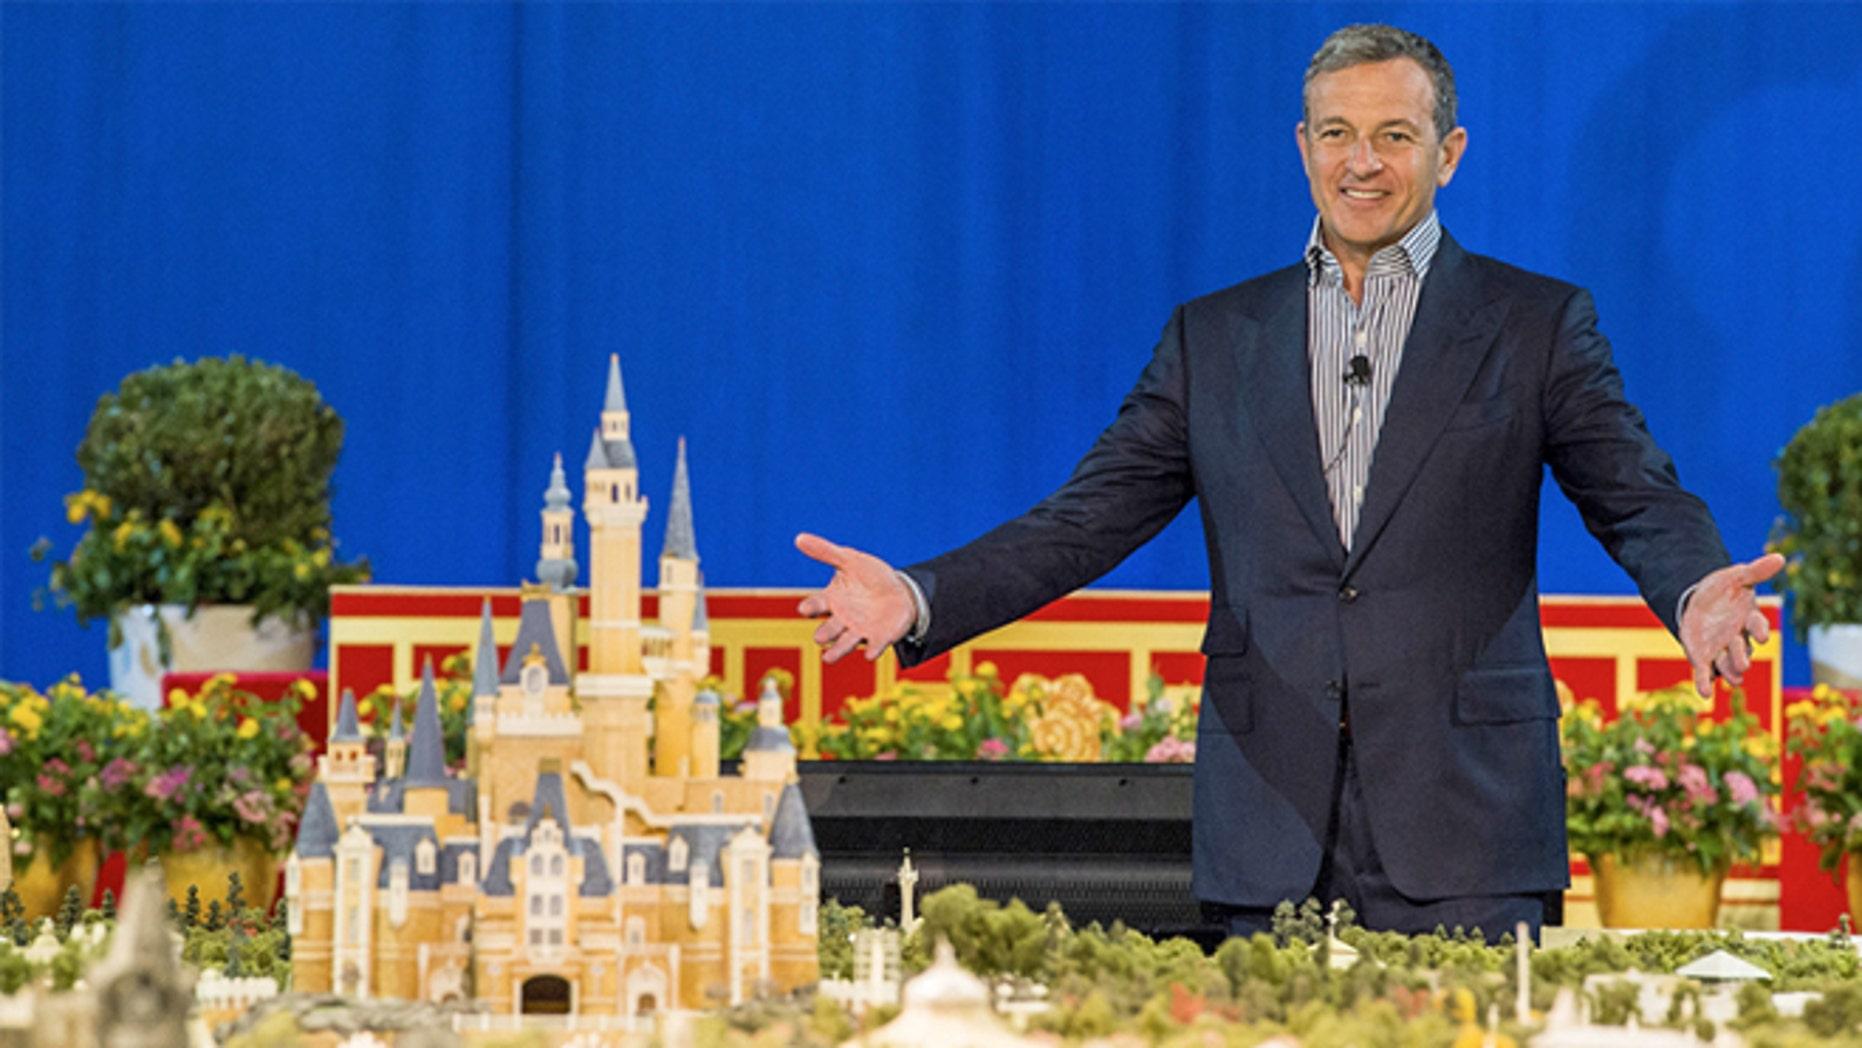 Disney's Robert Iger unveils Shanghai Disneyland.